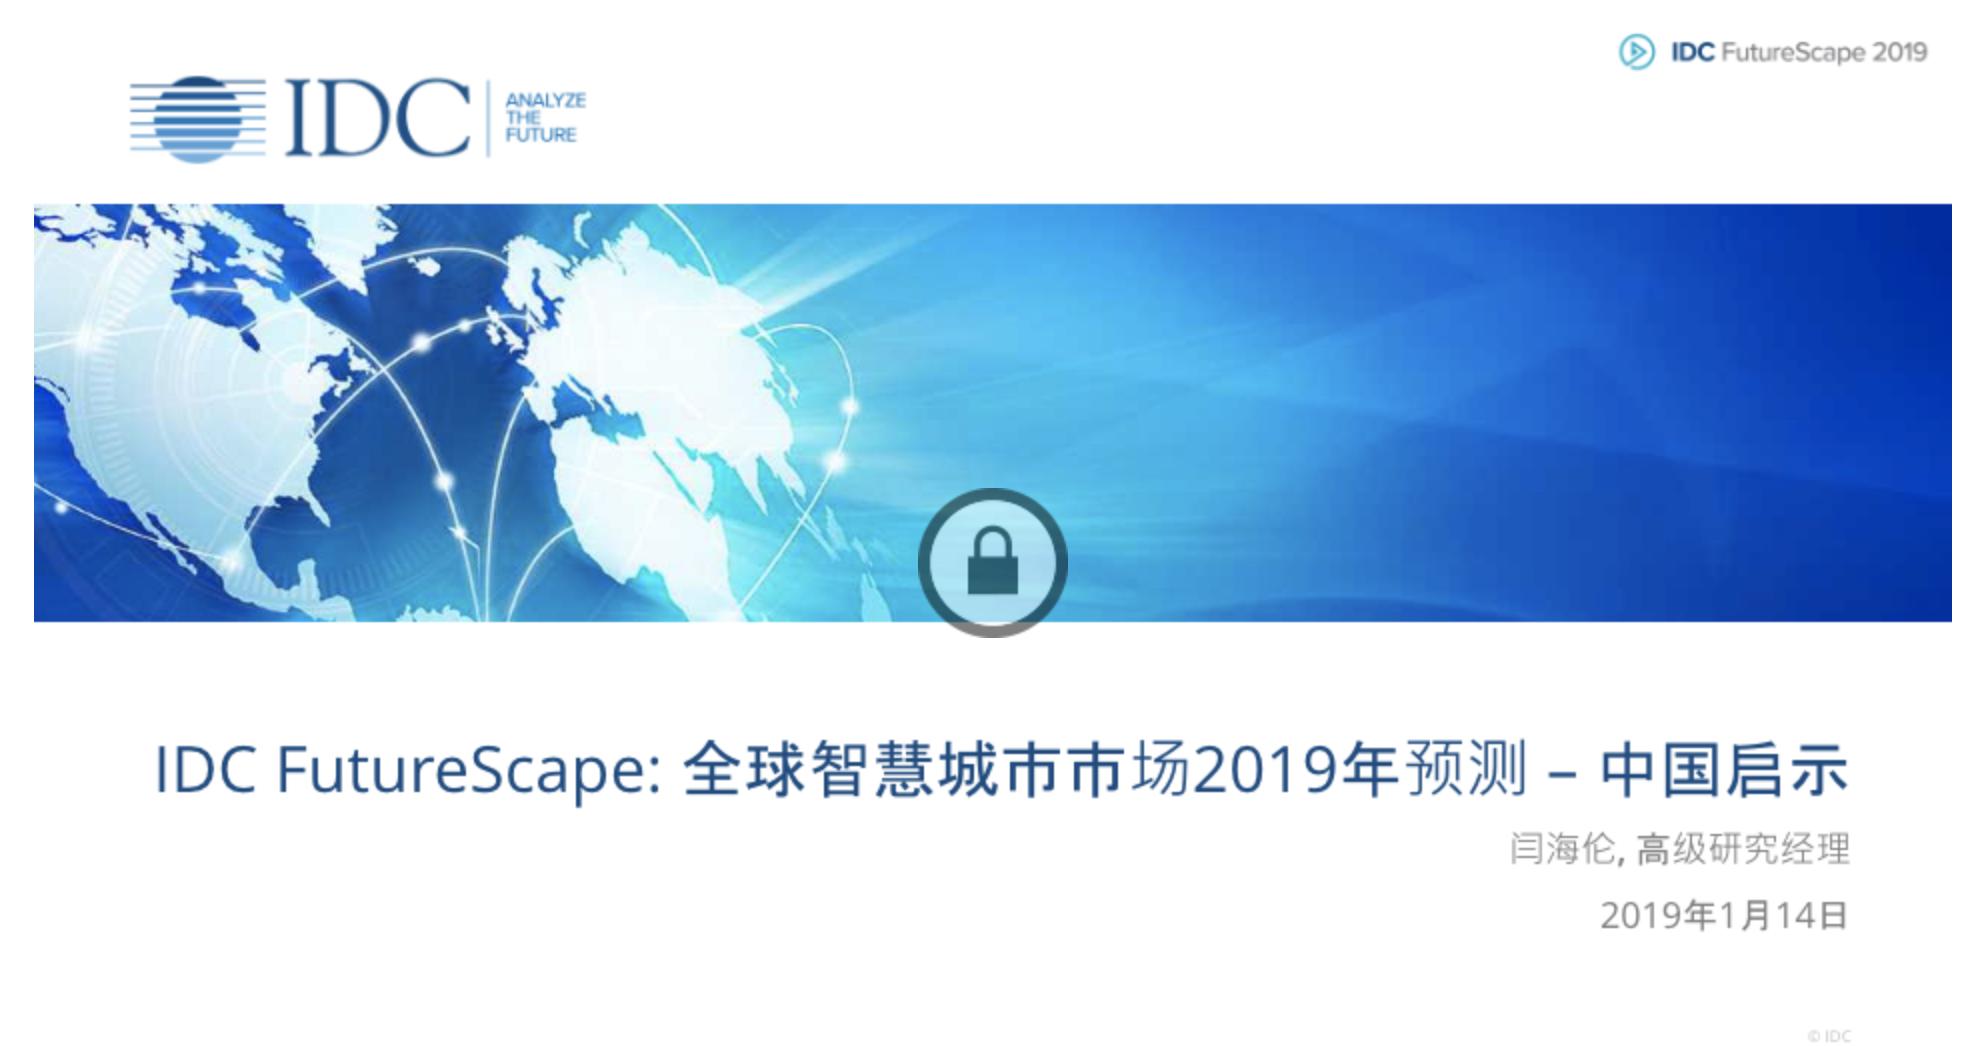 IDC发布:2019年全球智慧城市十大预测